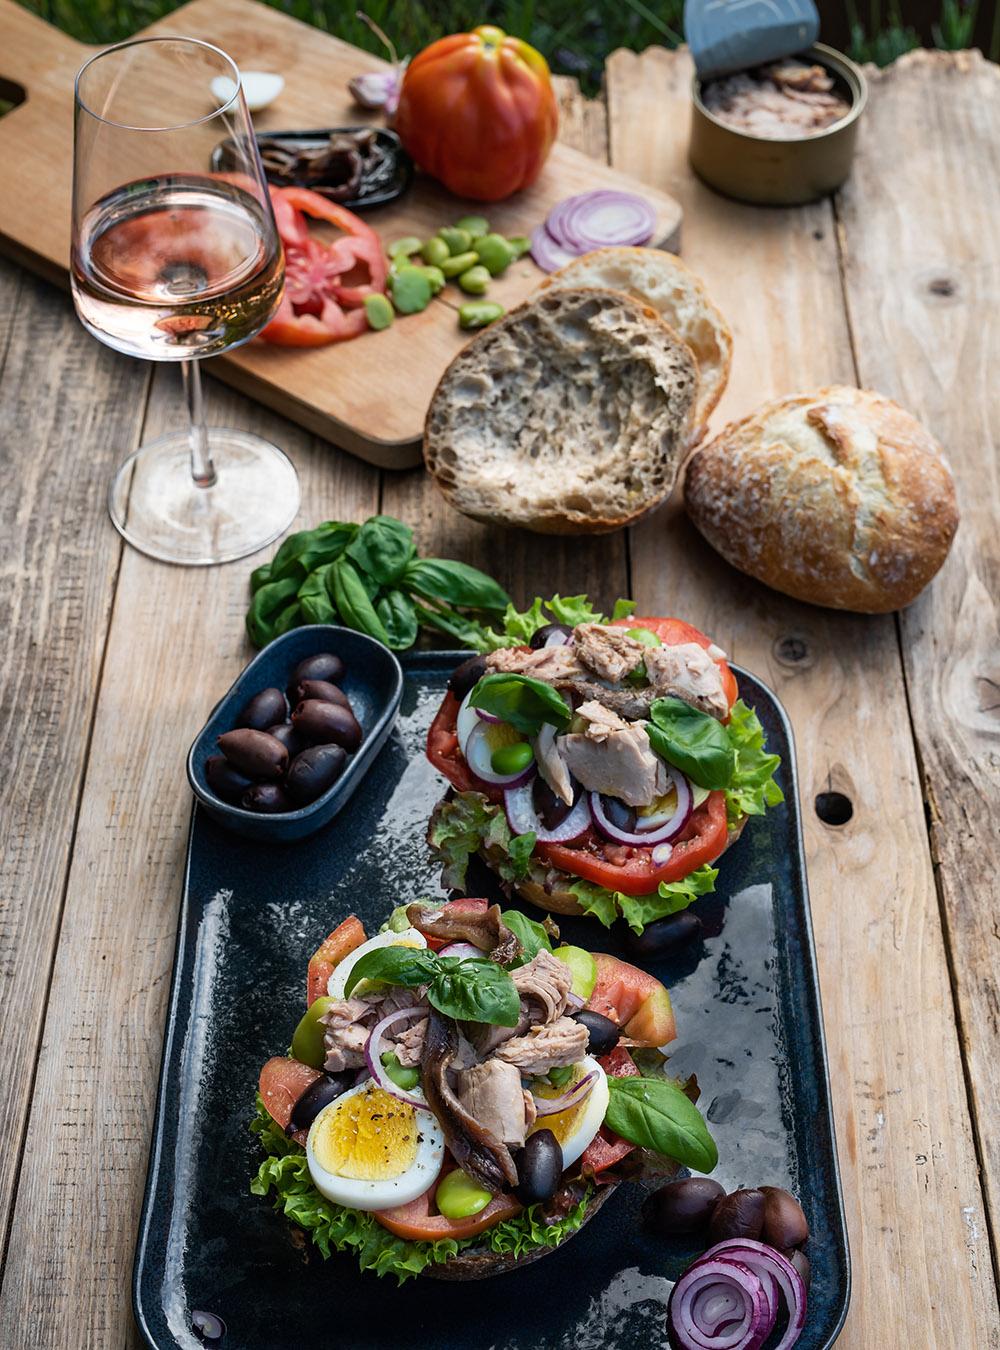 Pan Bagnat - fantastischer Sandwich Klassiker aus der Provence - Salade Niçoise im Brot